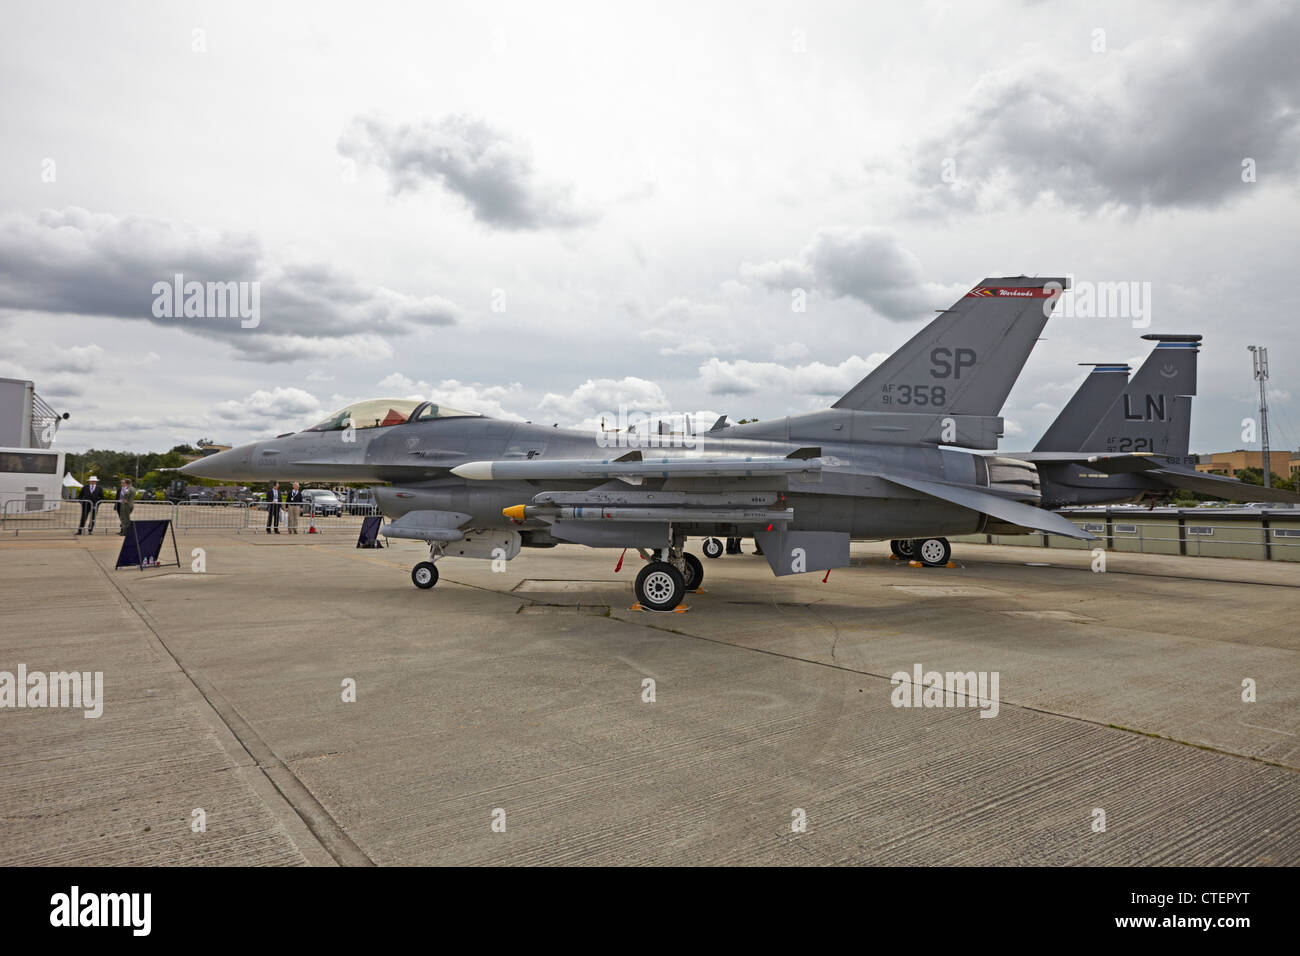 Farnborough International Airshow General Dynamics F-16 Fighting Falcon - Stock Image